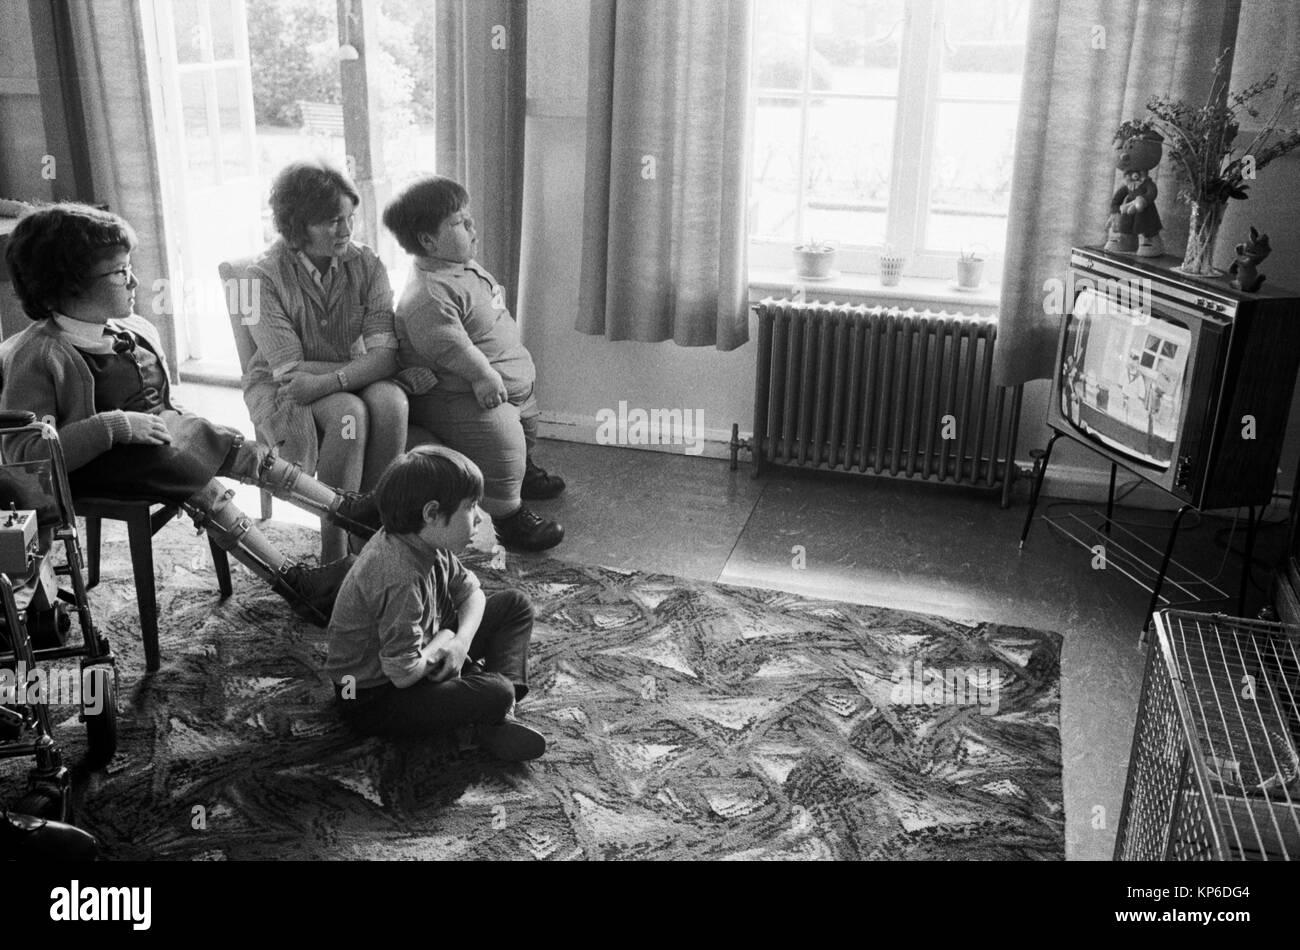 National Children's Home 1970s Uk  England Kids watching TV 70s Britain HOMER SYKES - Stock Image